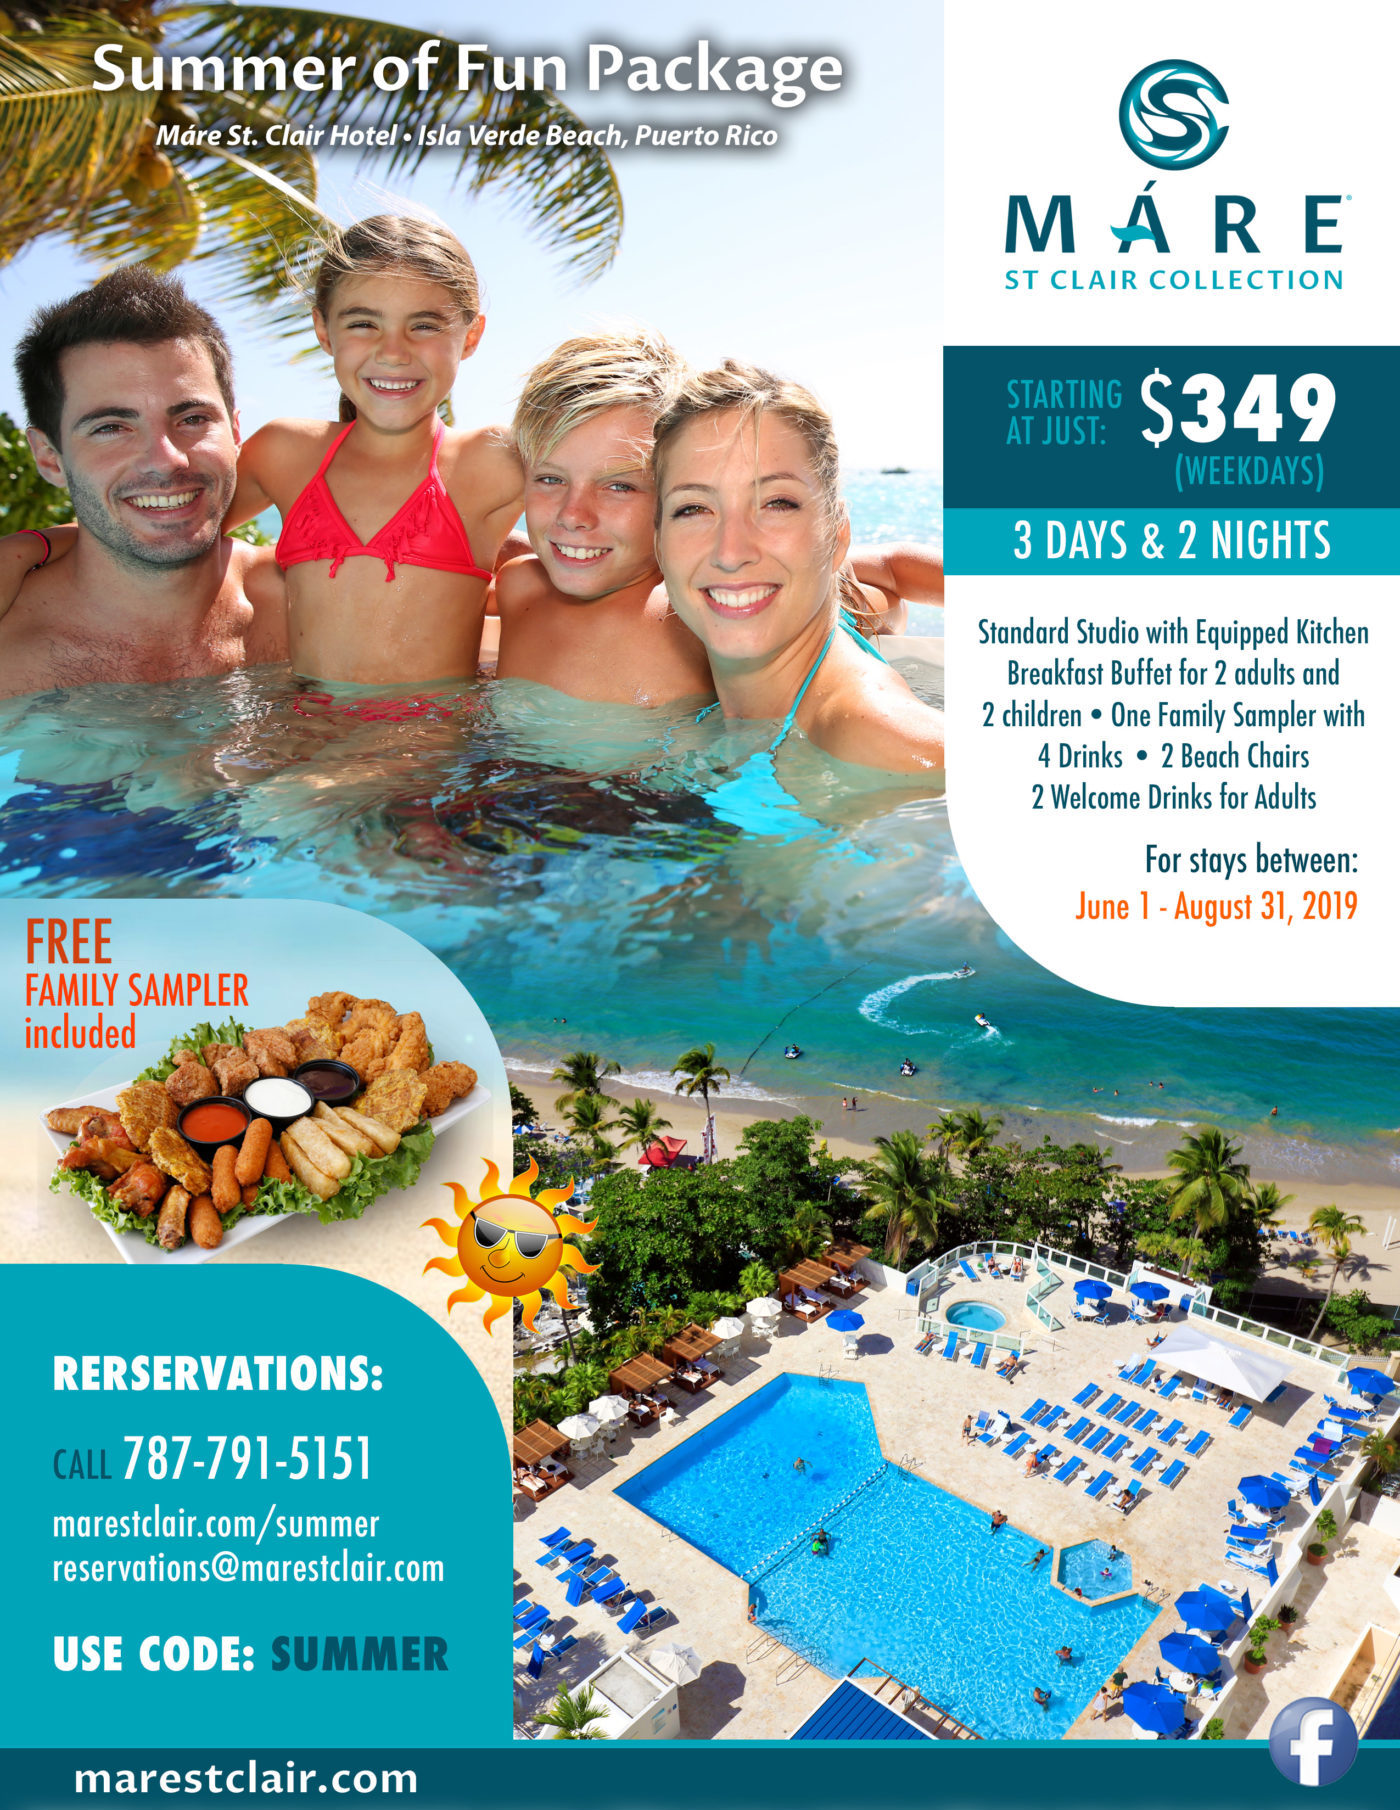 Summer of Fun Package, Máre St. Clair Hotel, Isla Verde Beach, Puerto Rico